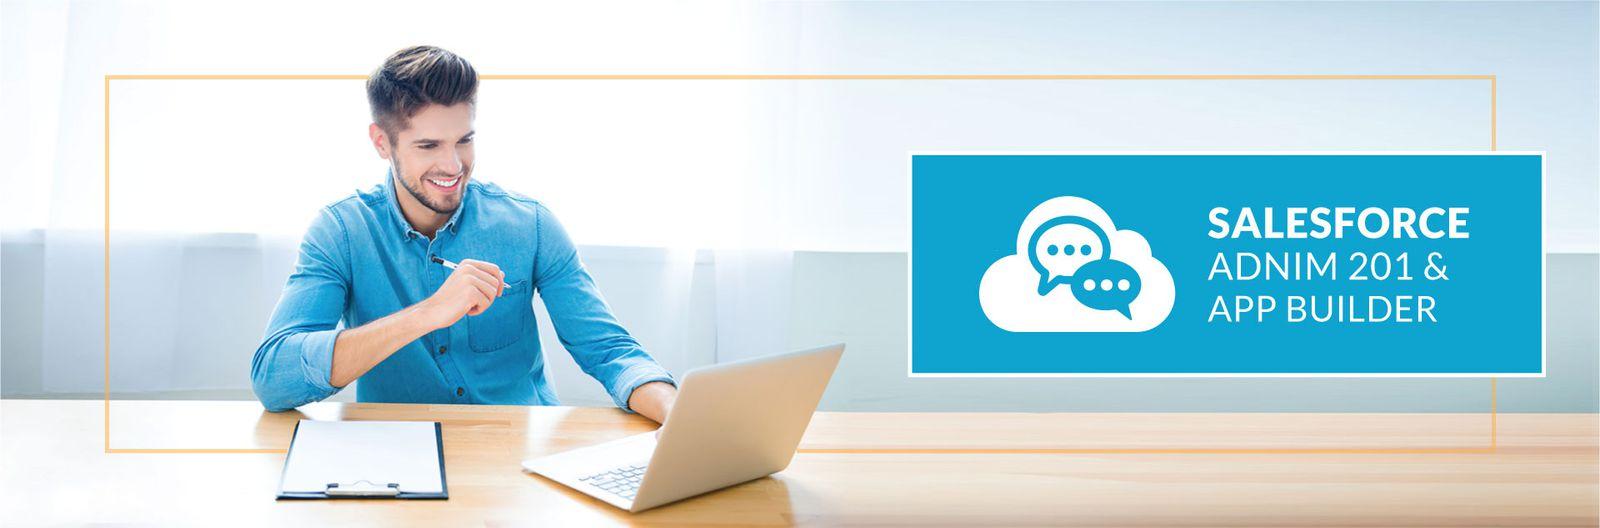 Salesforce Admin Jobs Work From Home